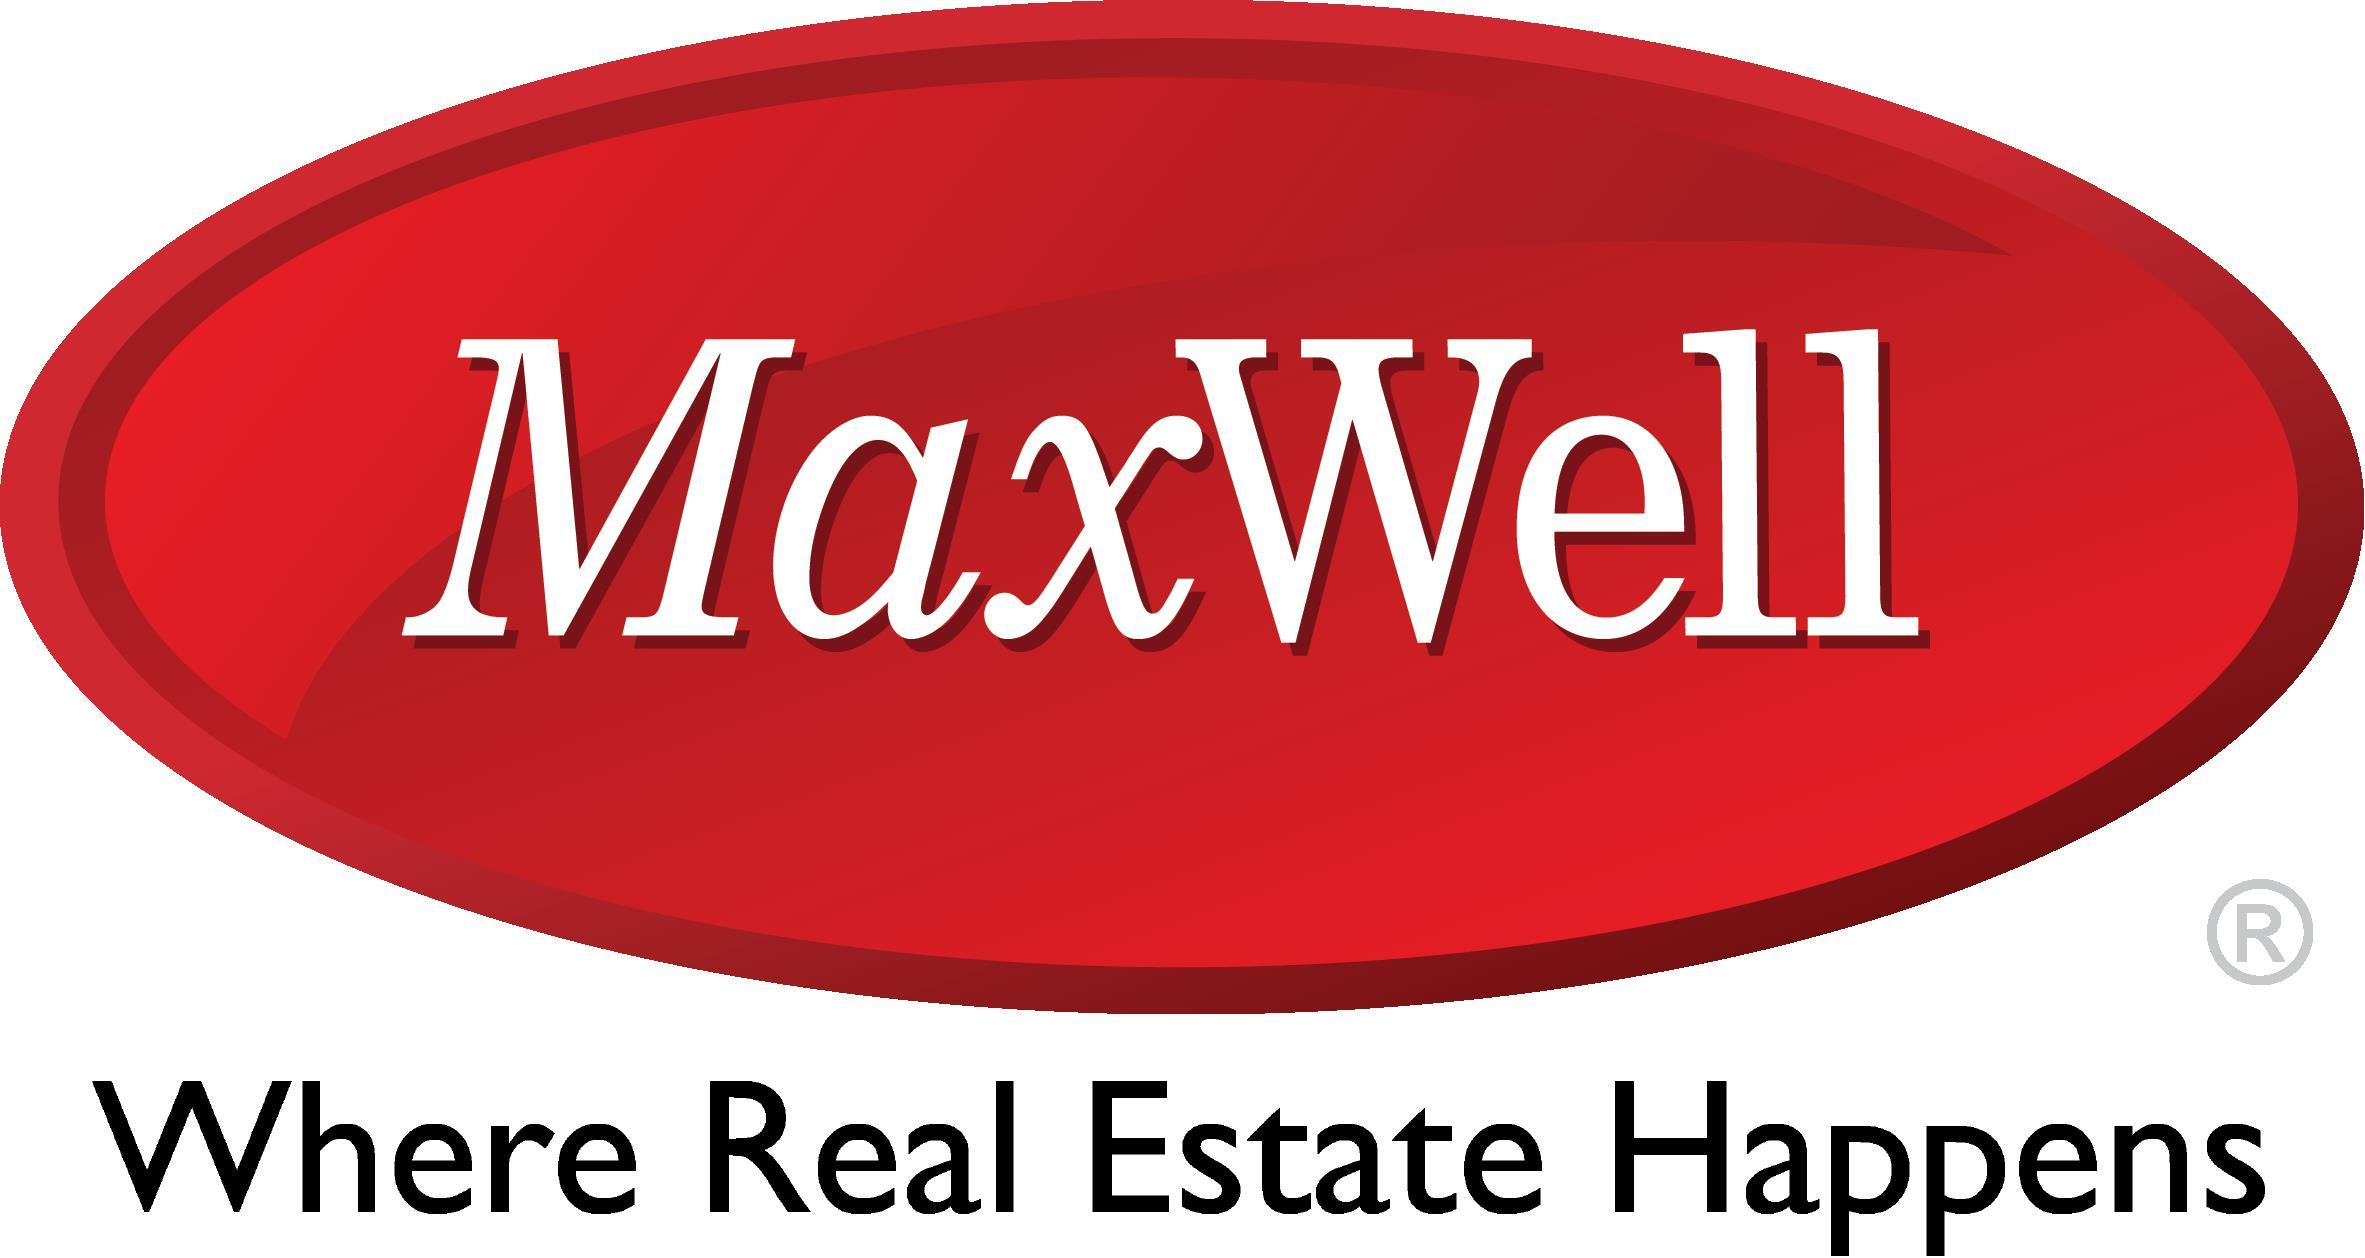 Maxwell Realty